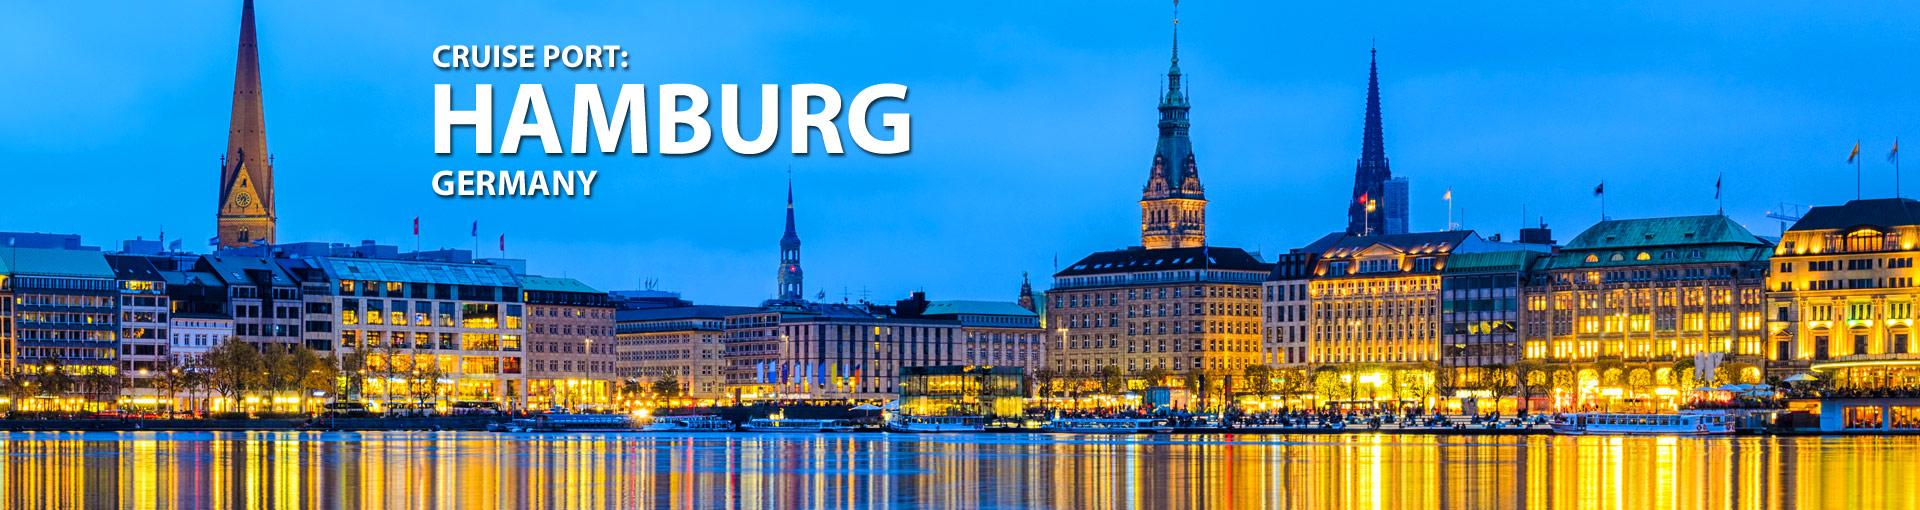 hamburg germany cruise port 2017 and 2018 cruises from